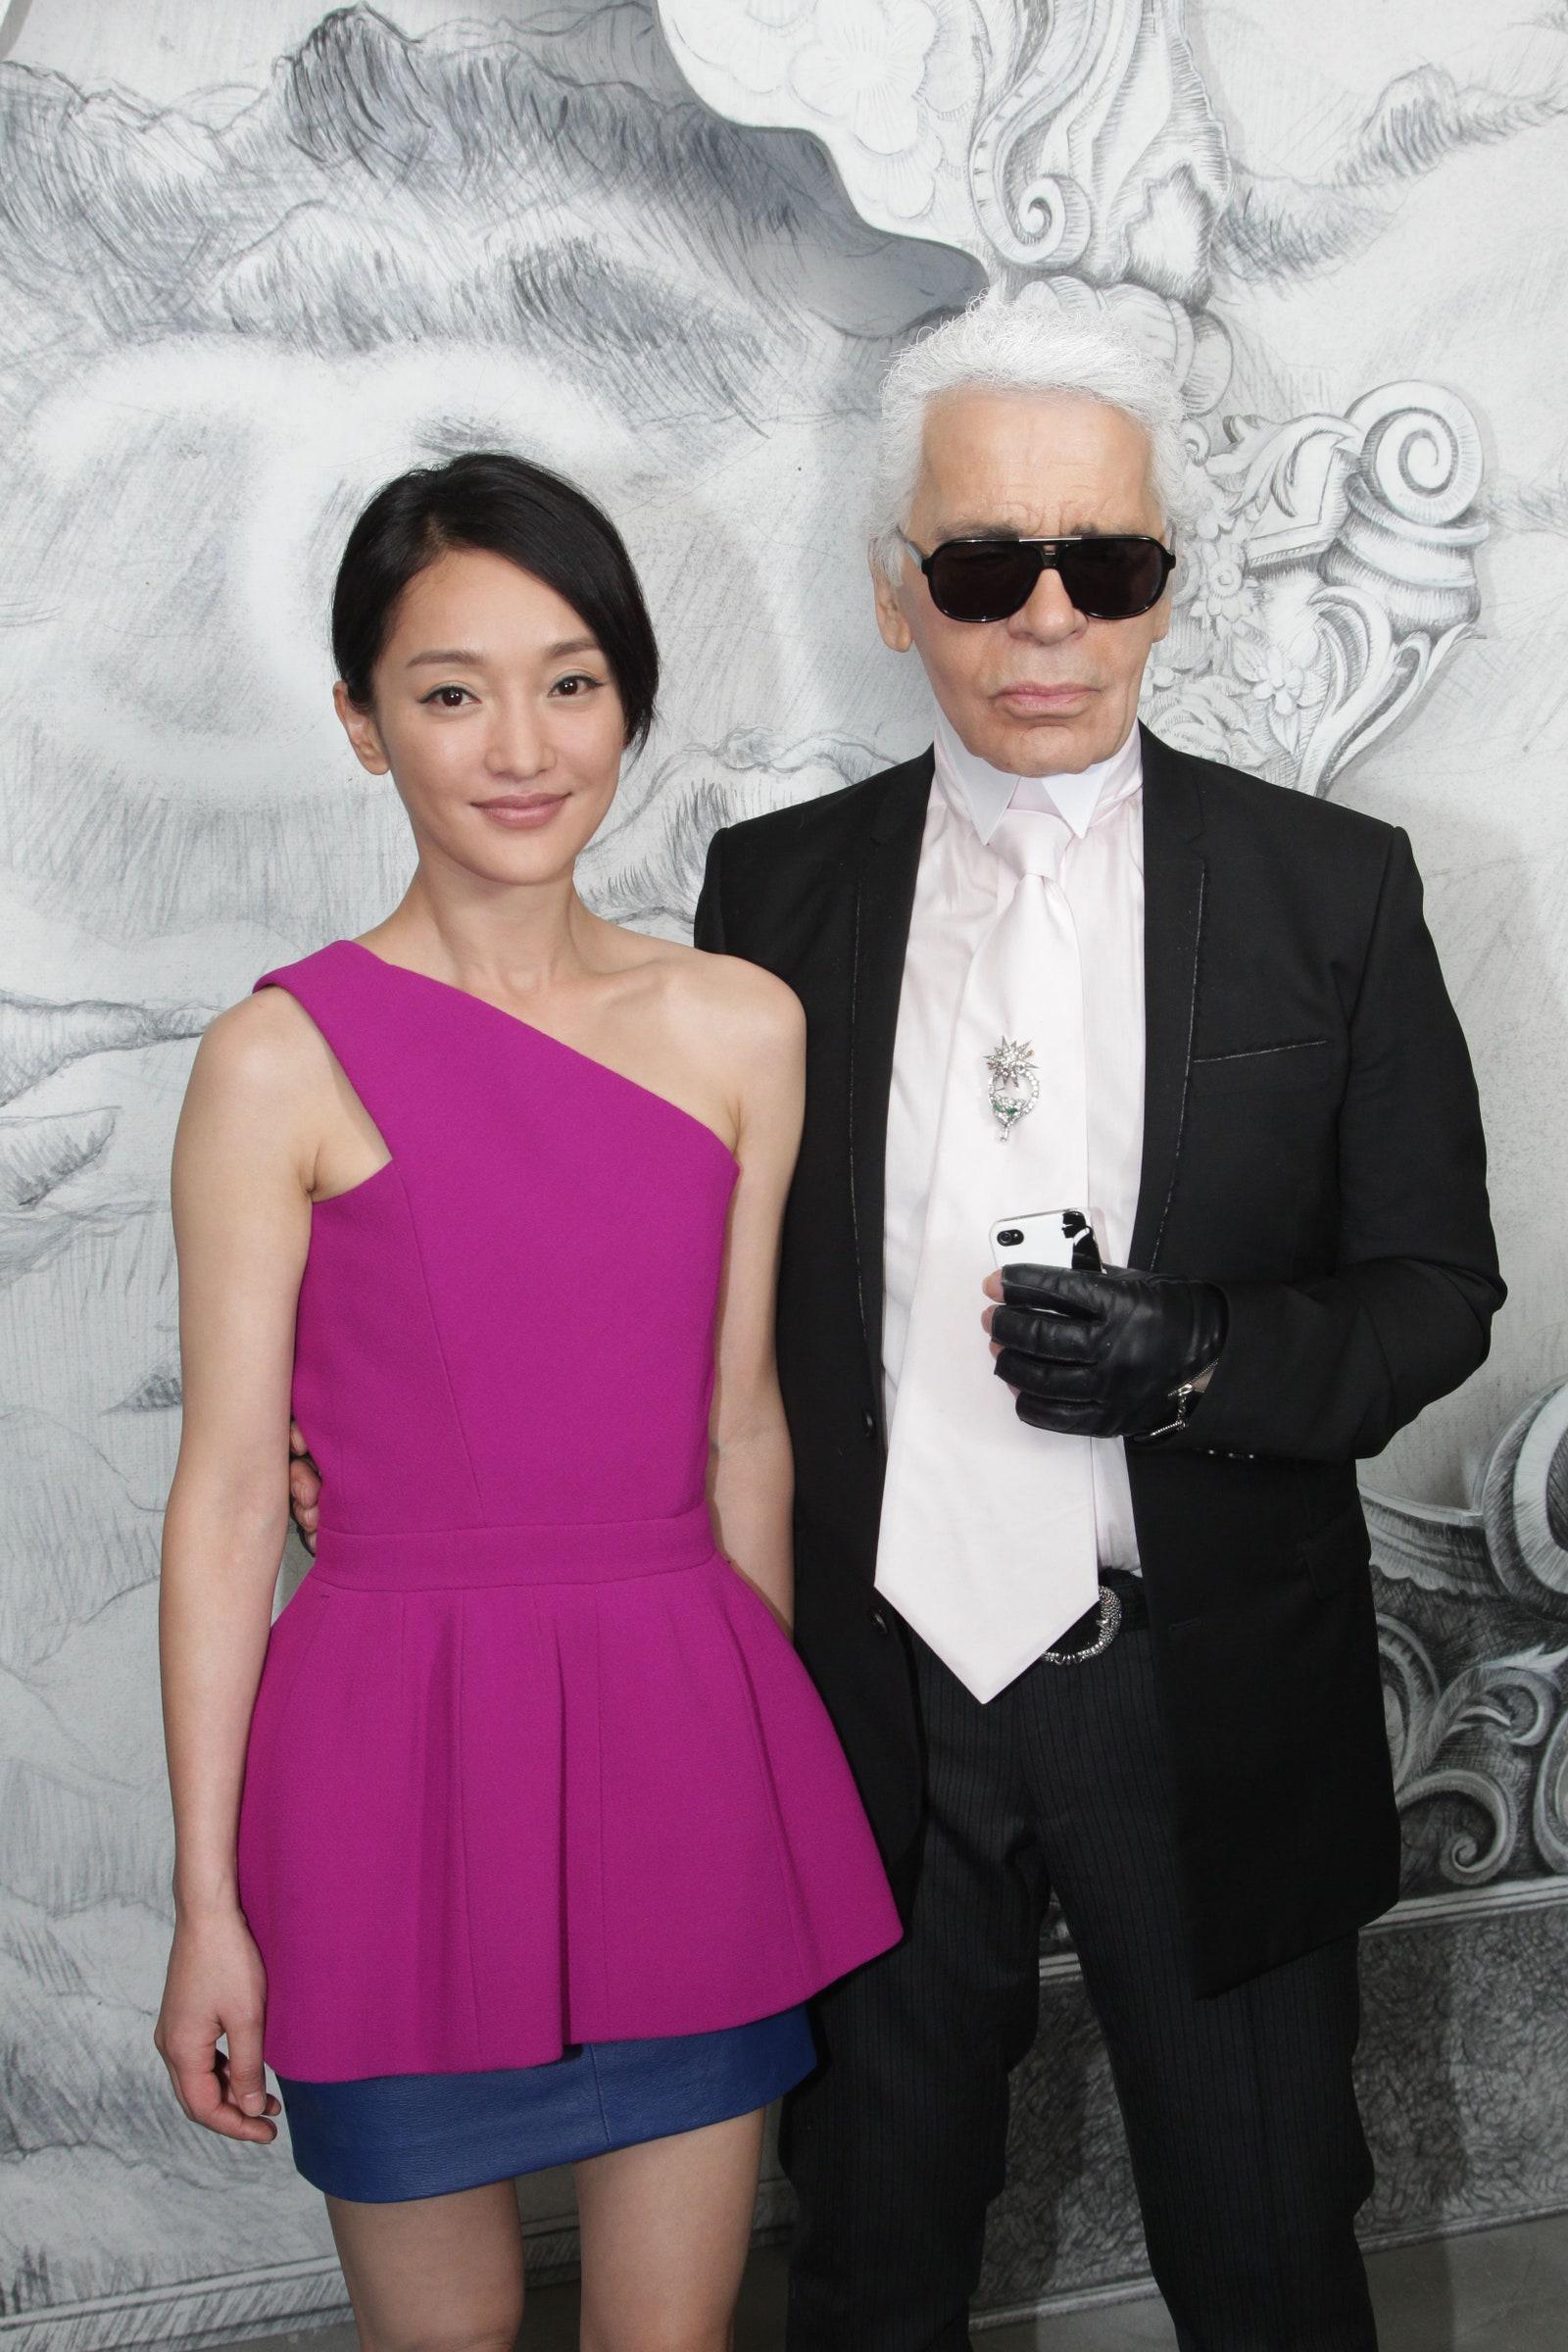 Châu Tấn gặp gỡ NTK Karl Lagerfeld